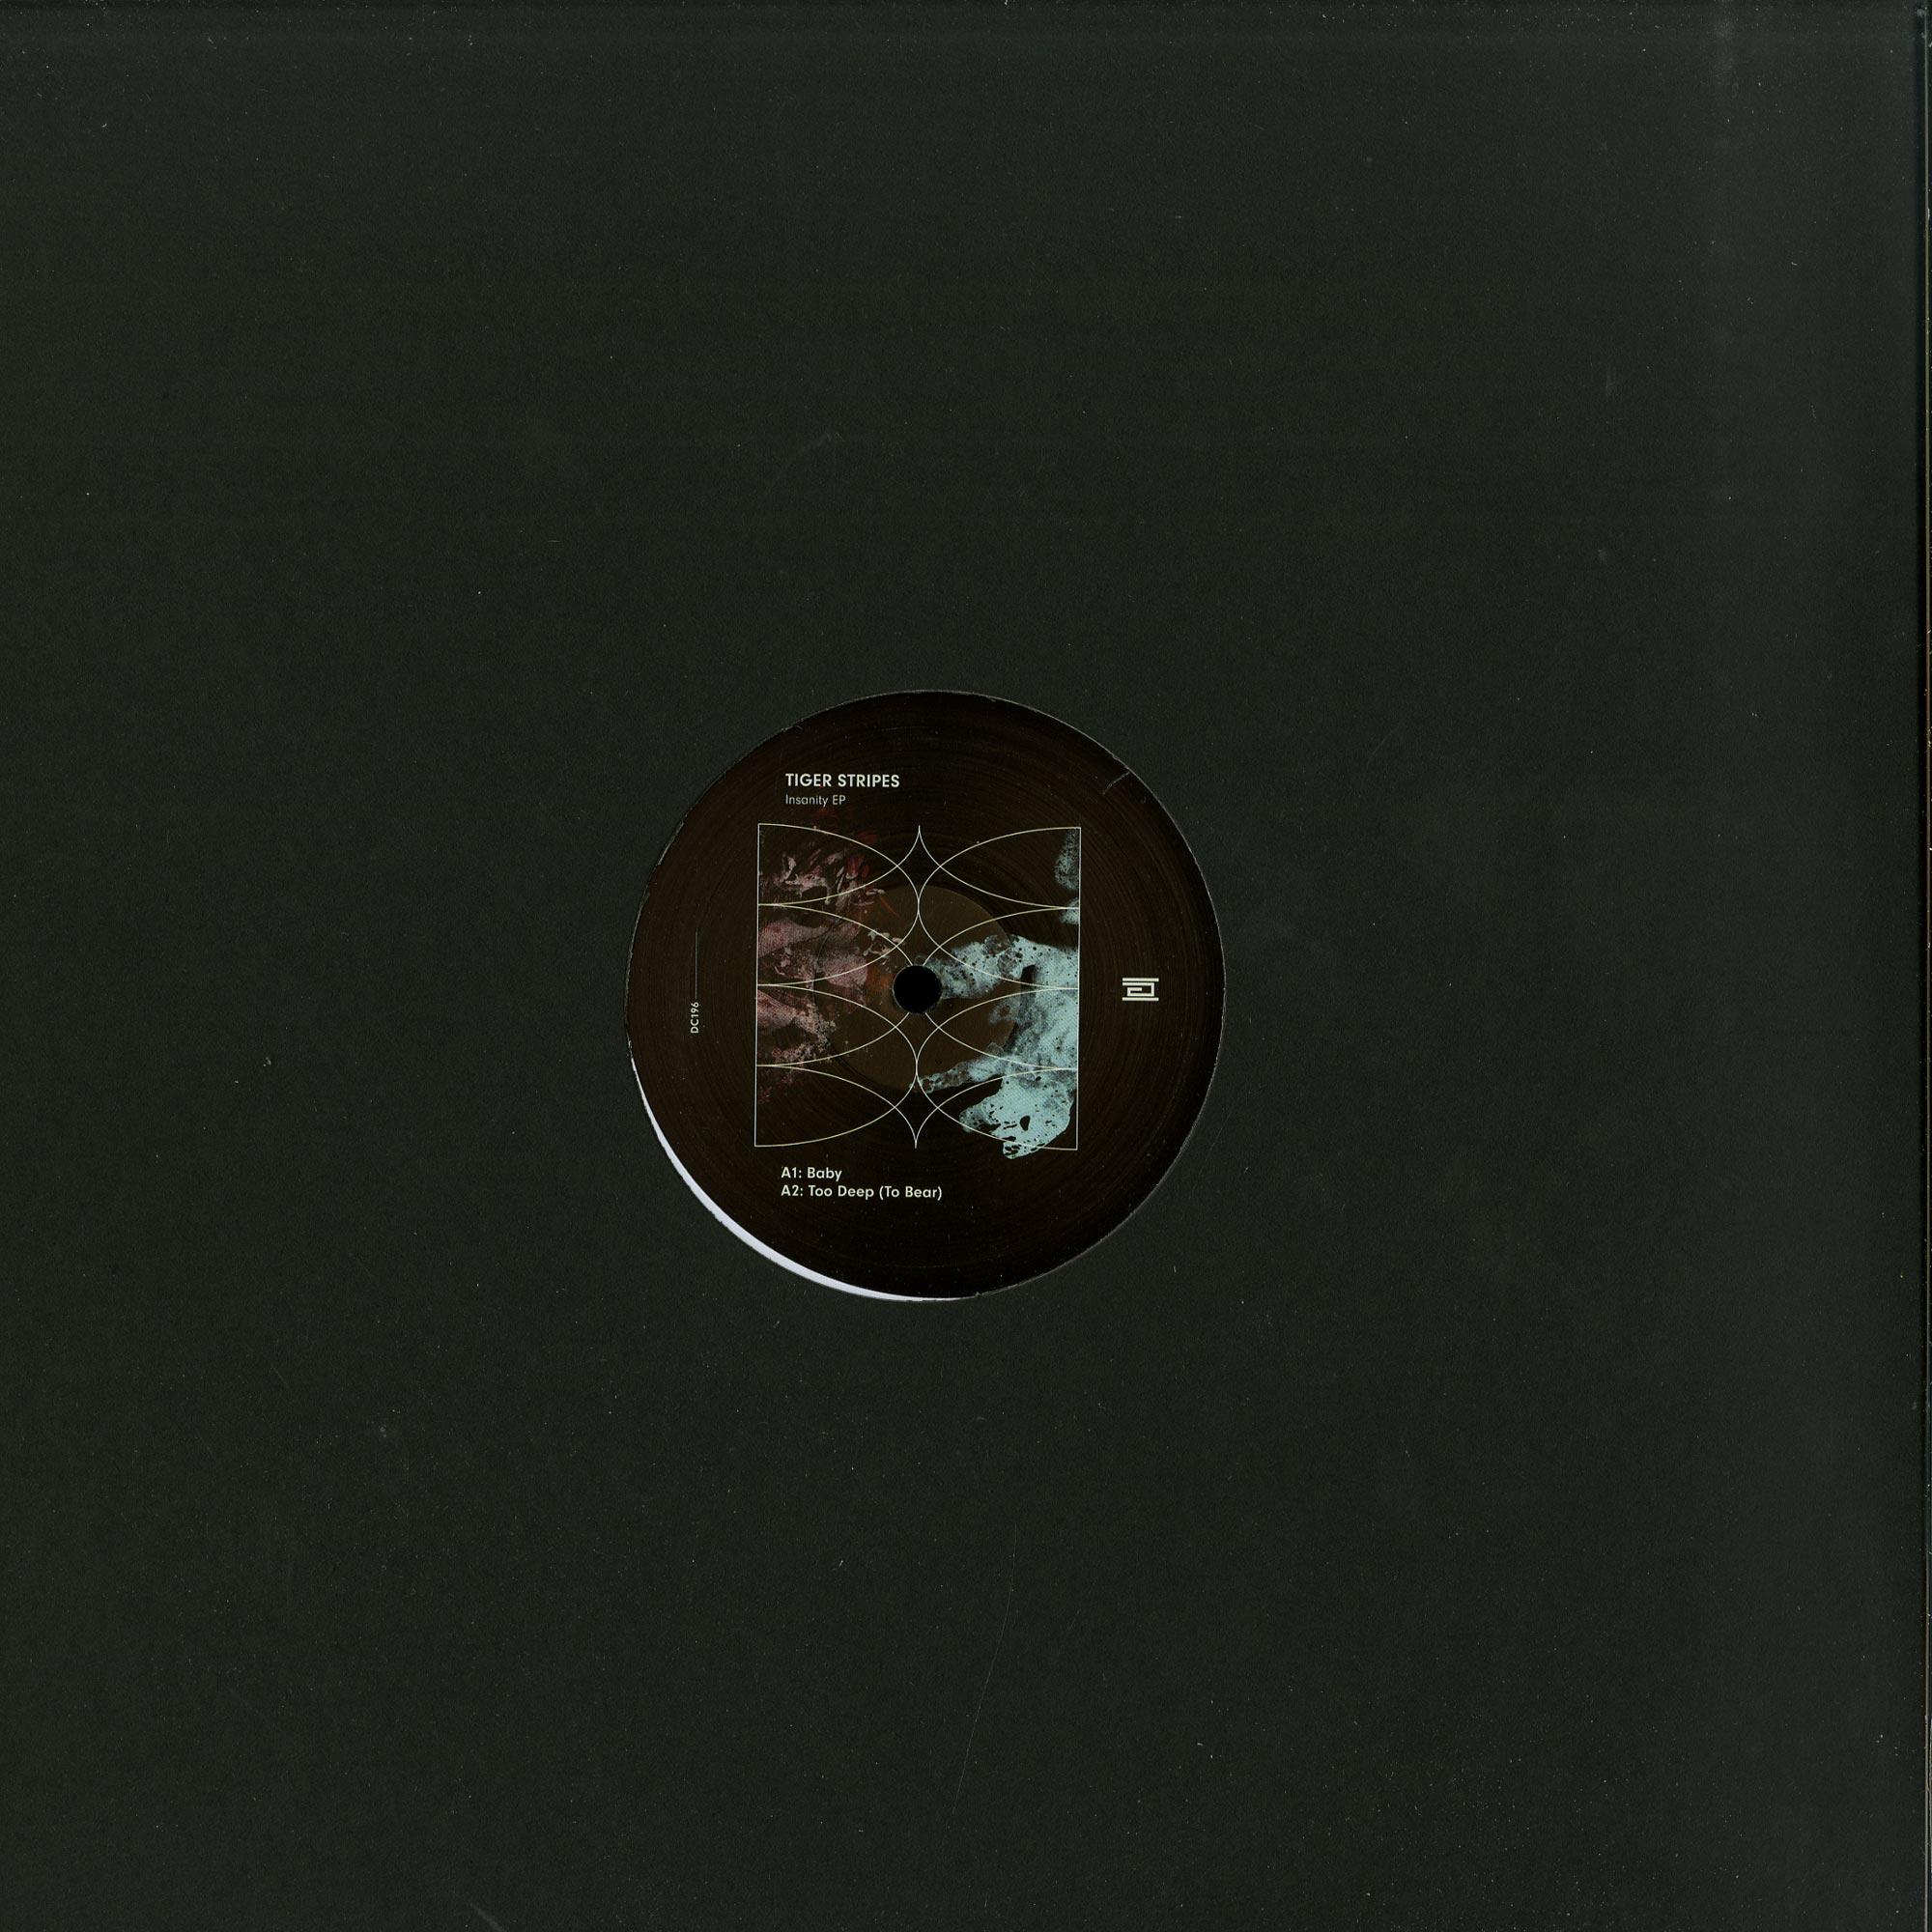 Tiger Stripes - INSANITY EP